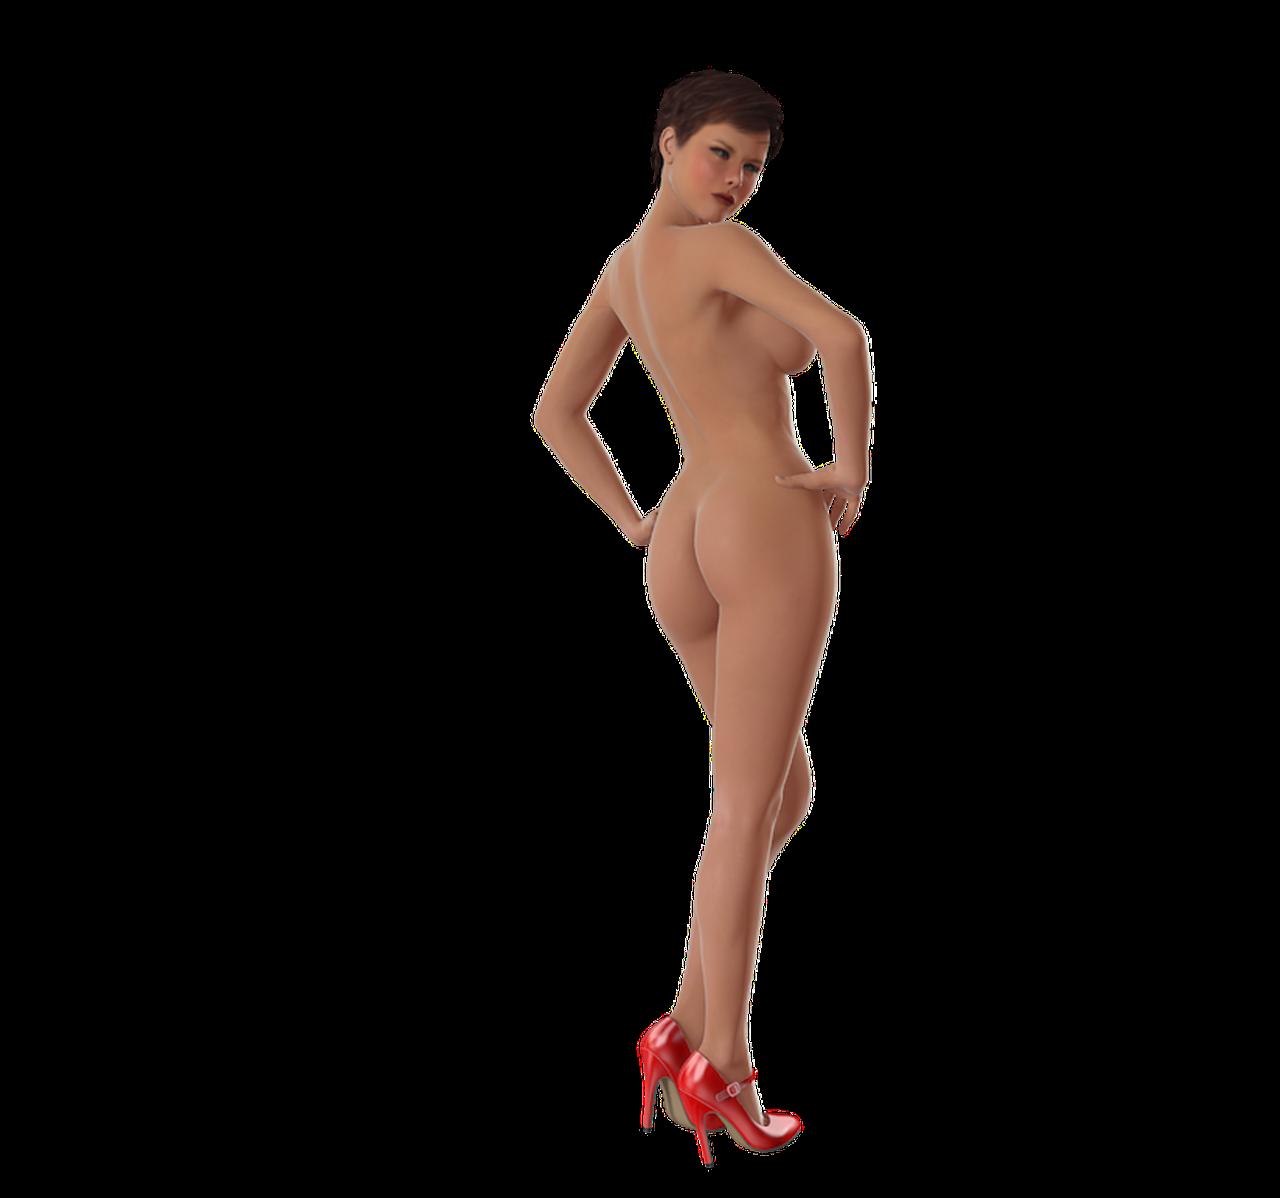 nude-women-png-pics-xxx-porn-school